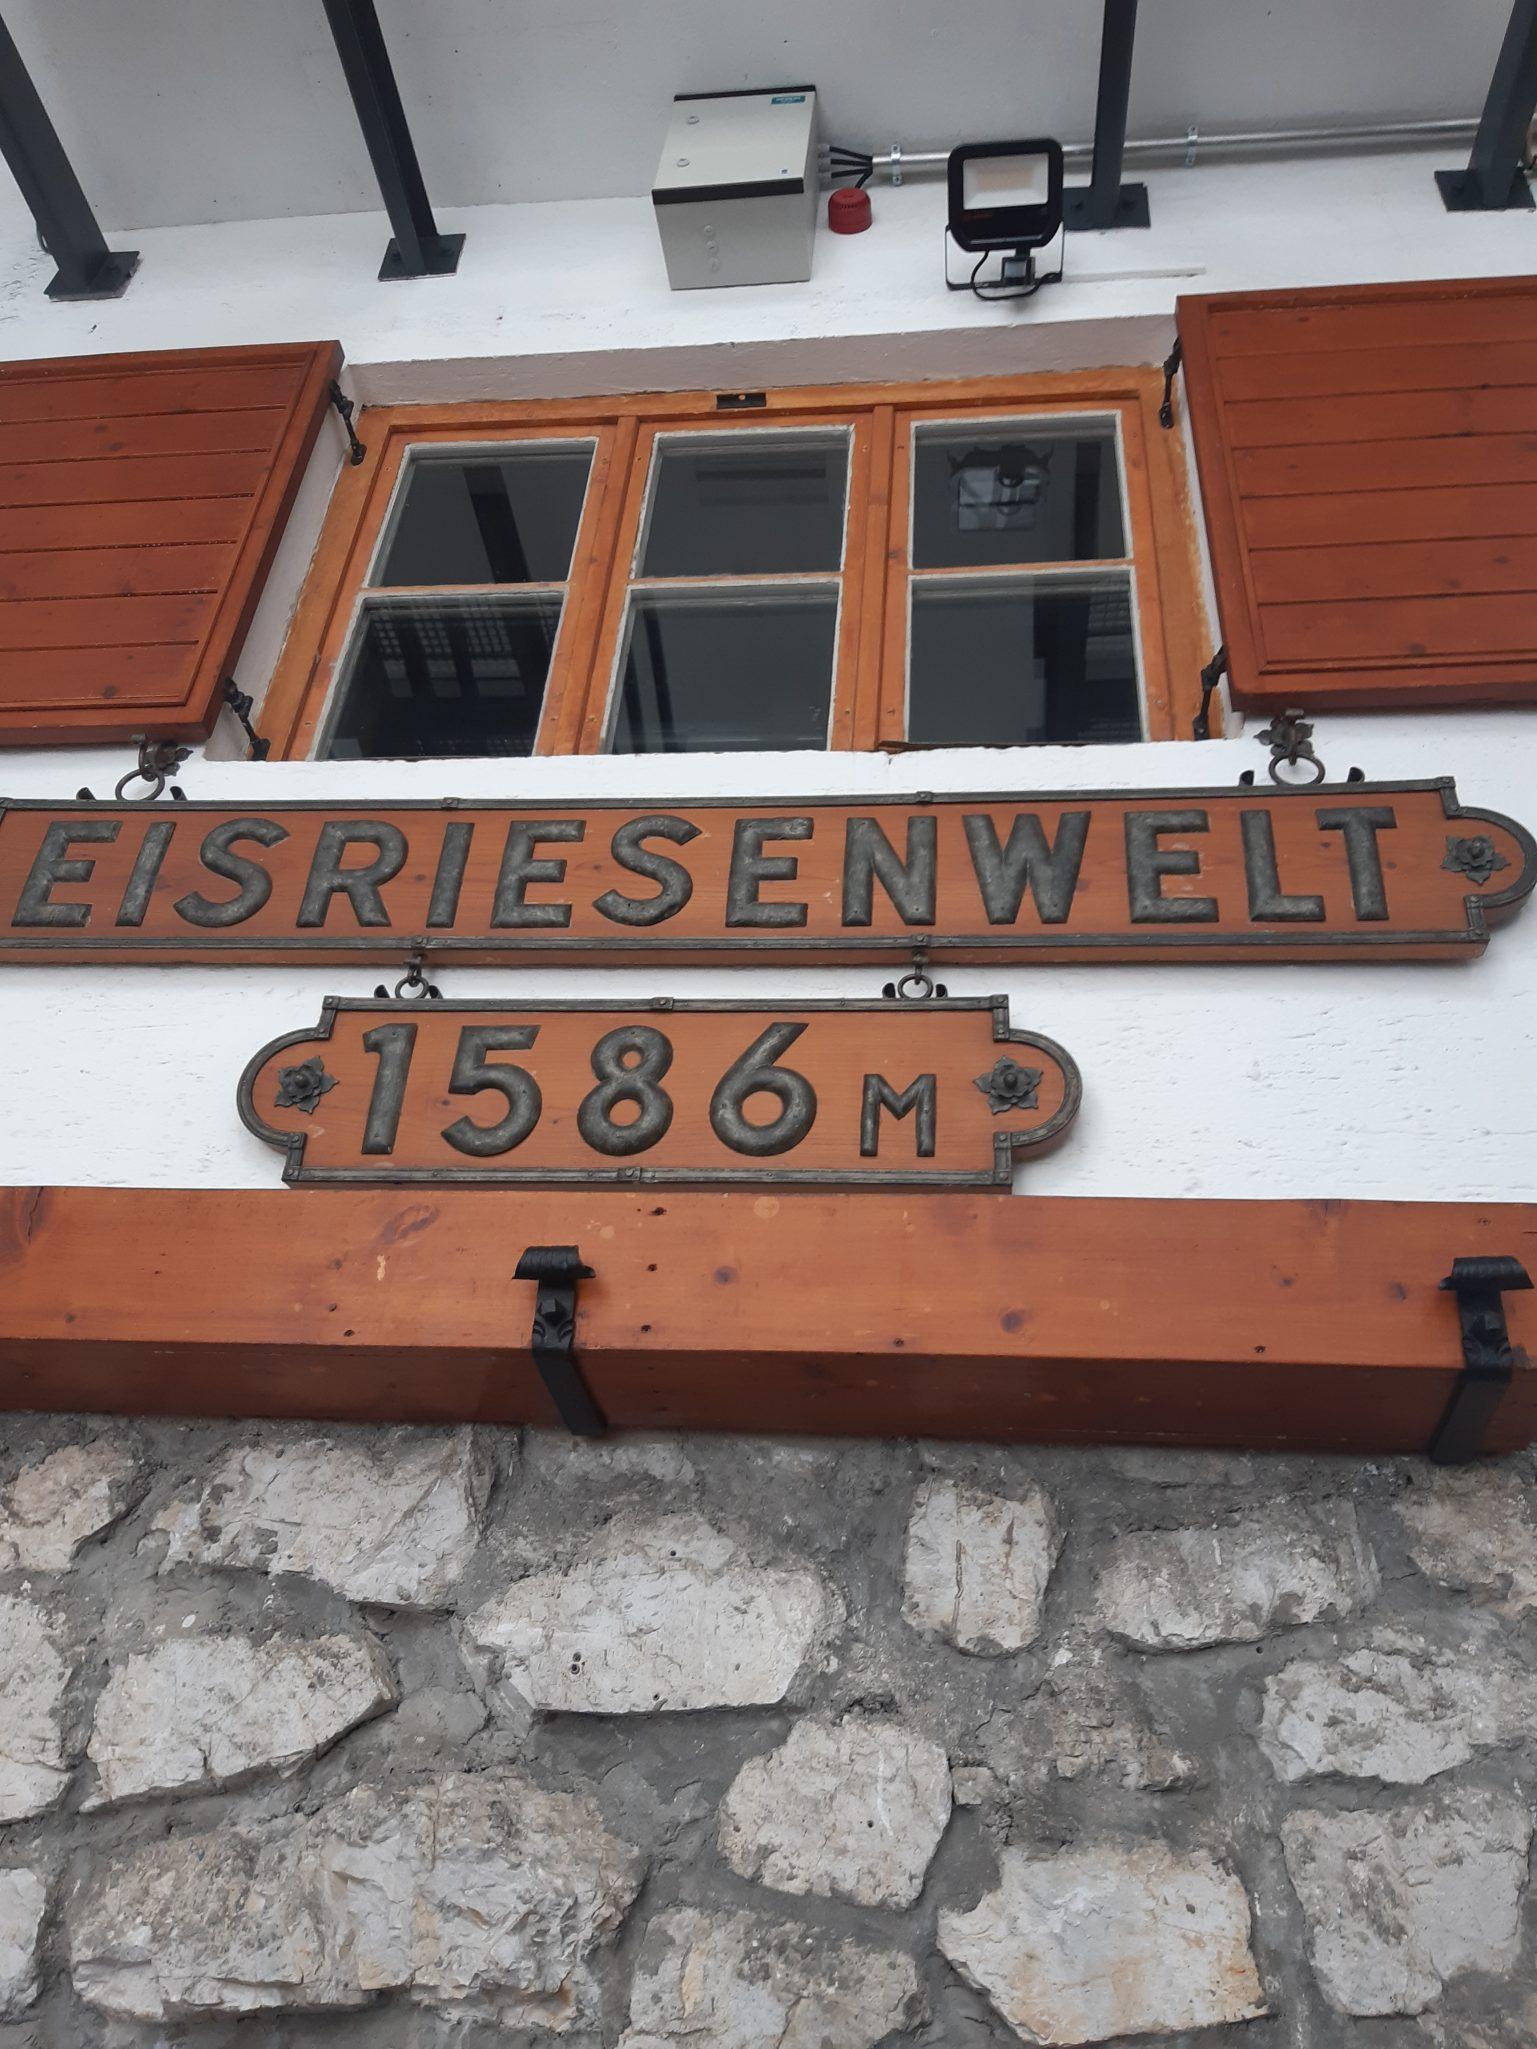 Höhe 1586 Eisriesenwelt Seilbahn